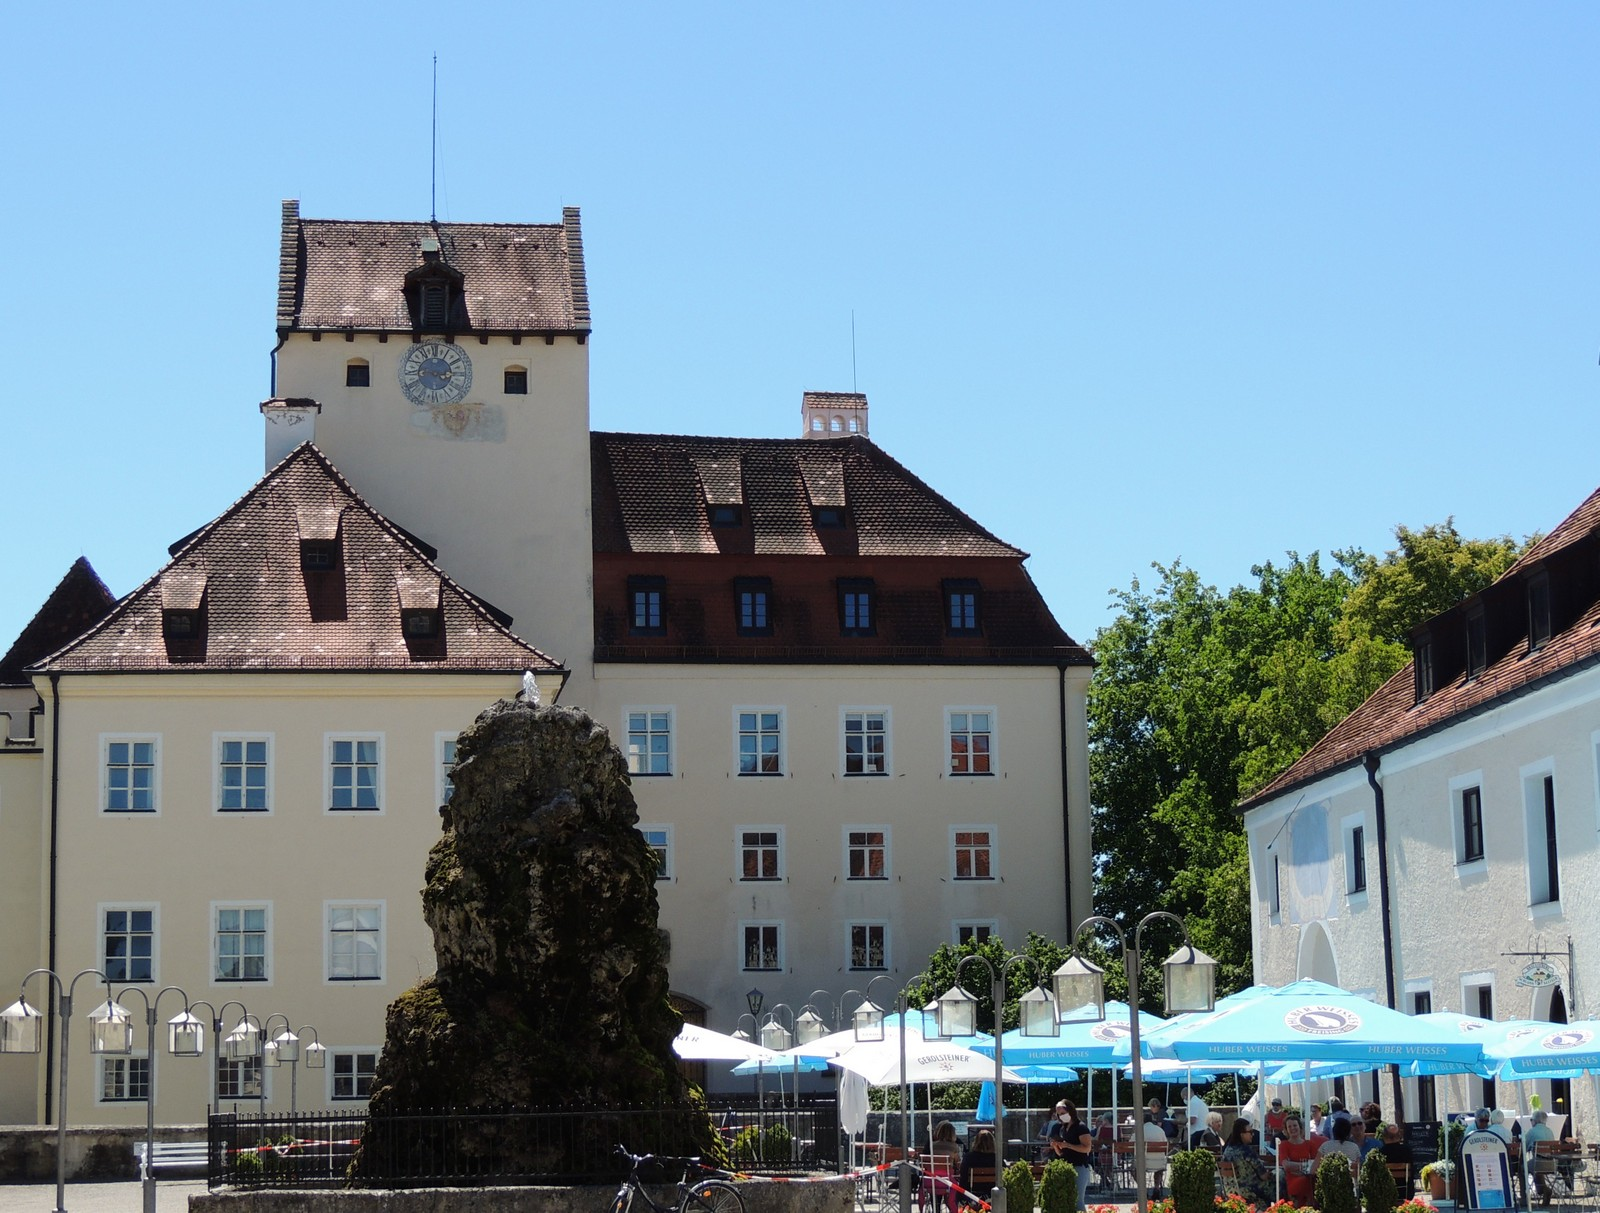 Fünf-Seen-Land - Schloss Seefeld